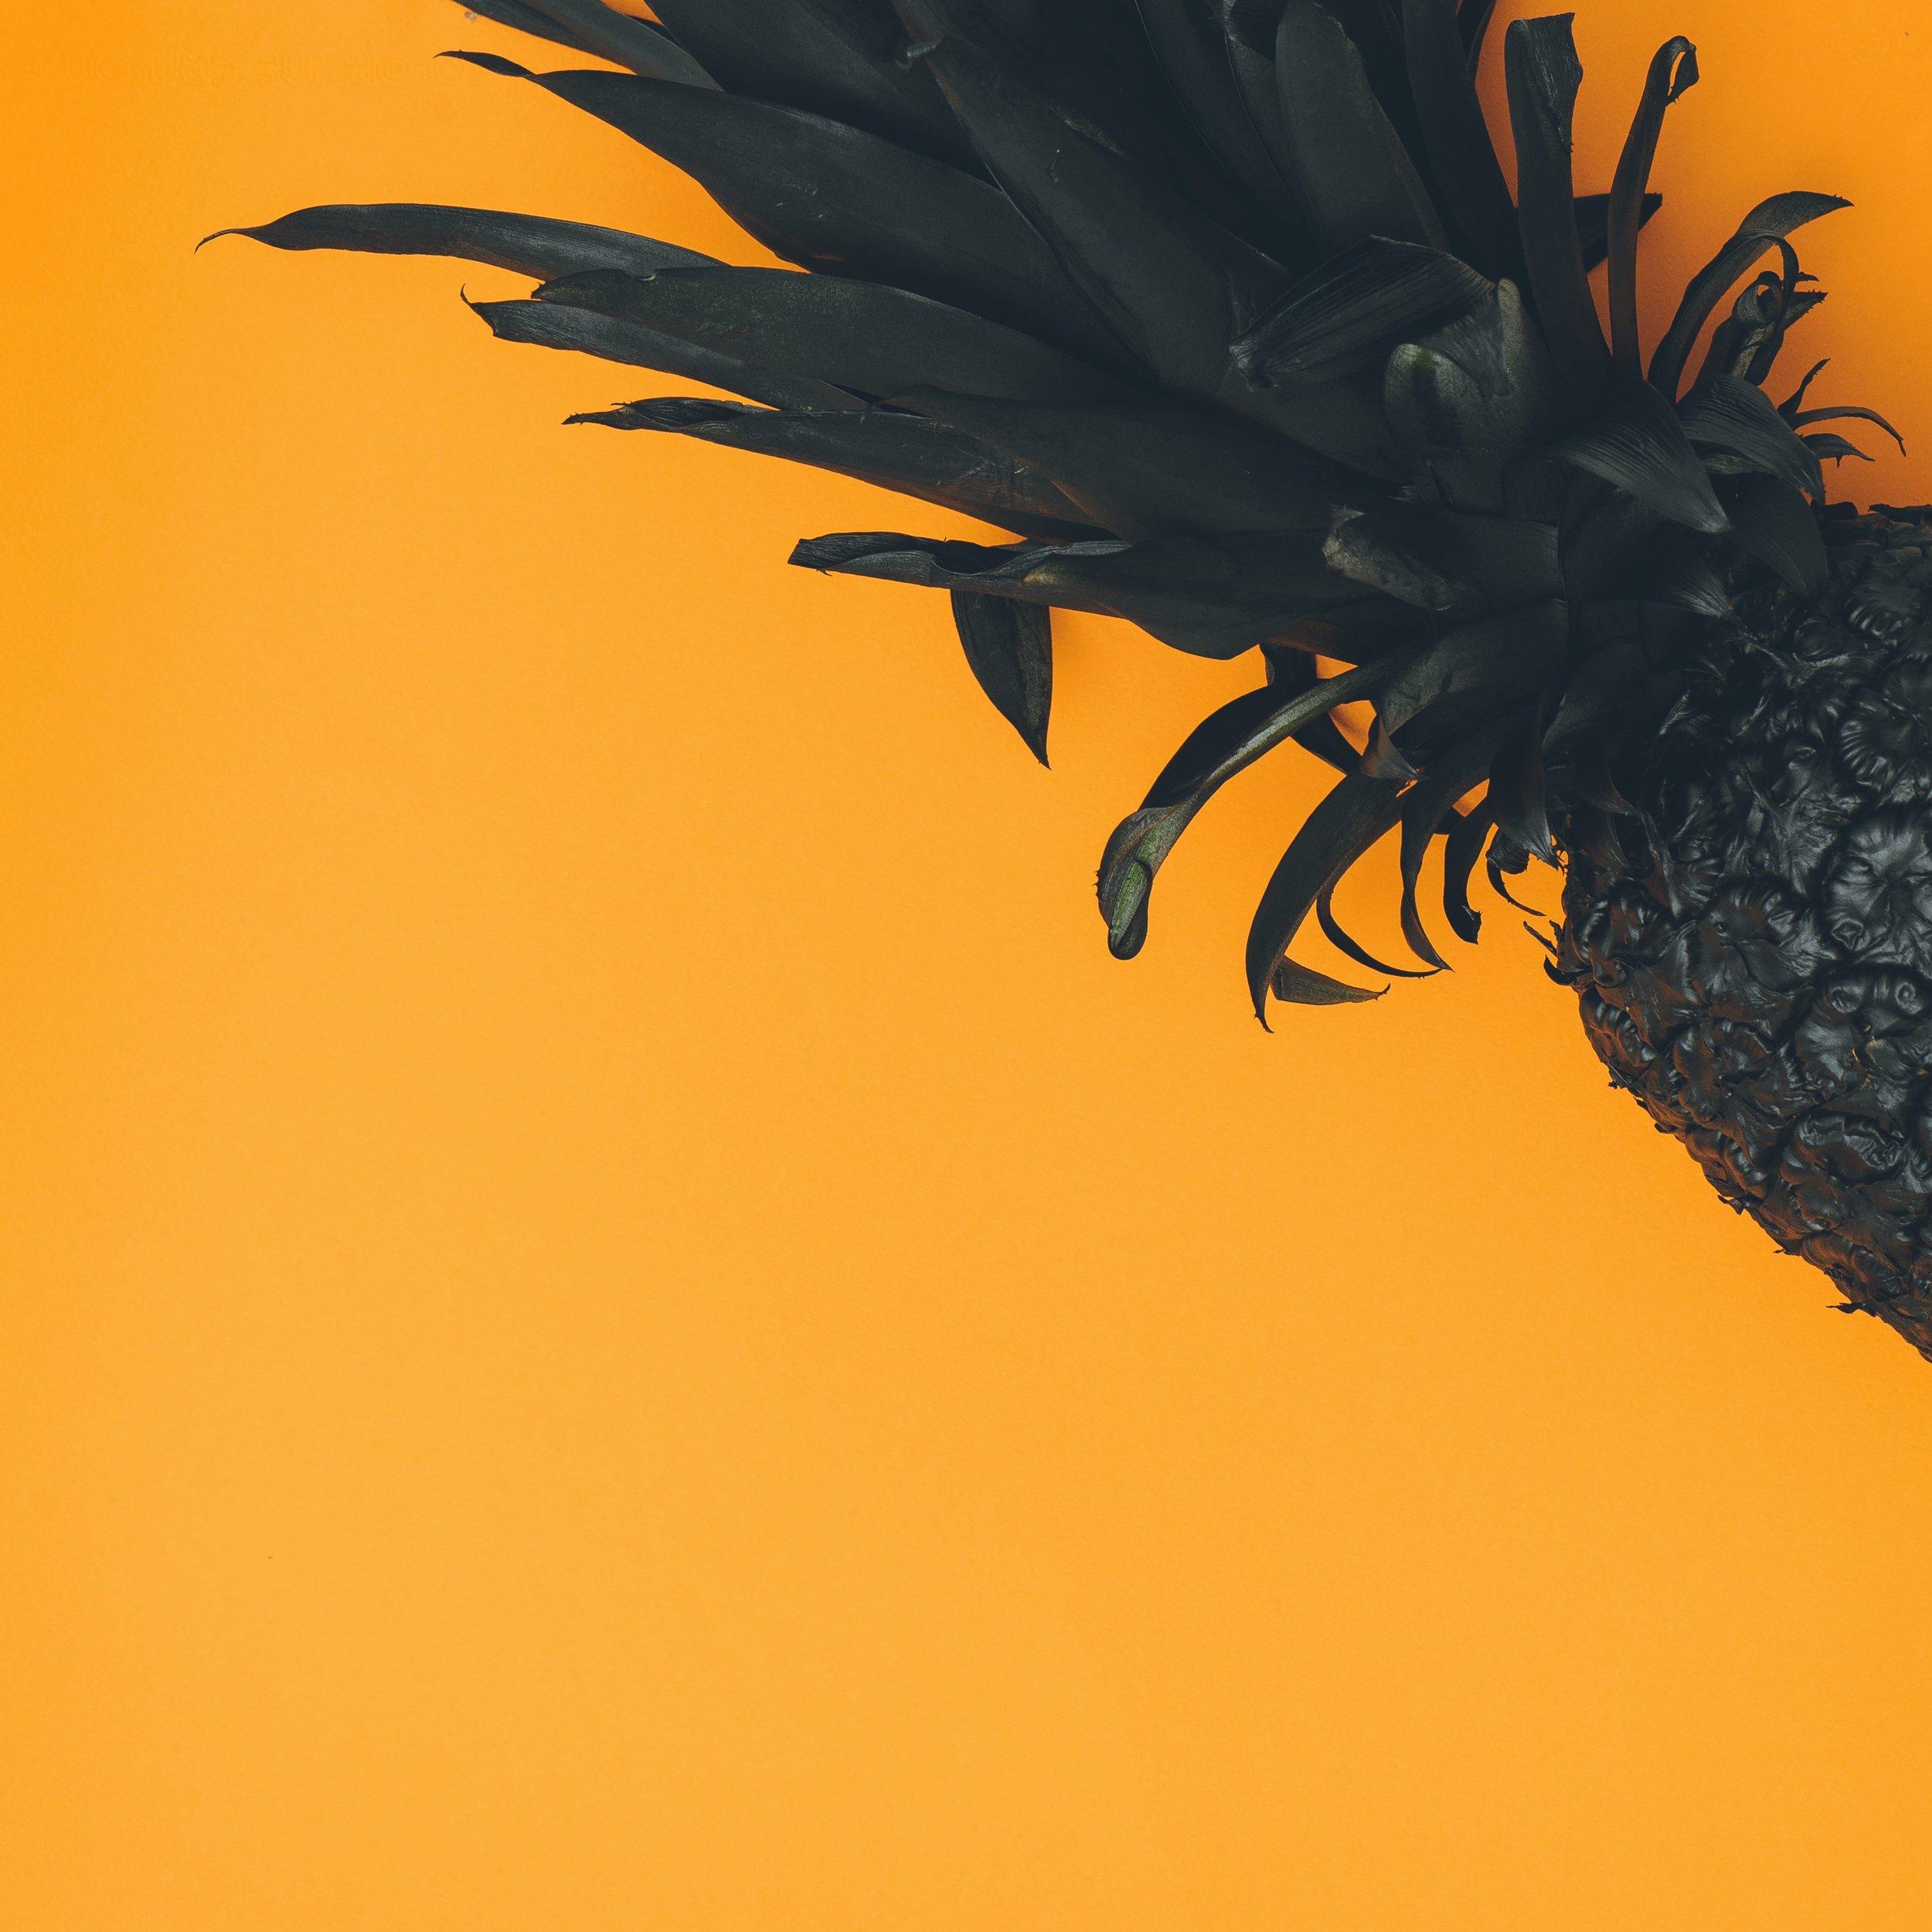 pineapple-supply-co-378132.jpg